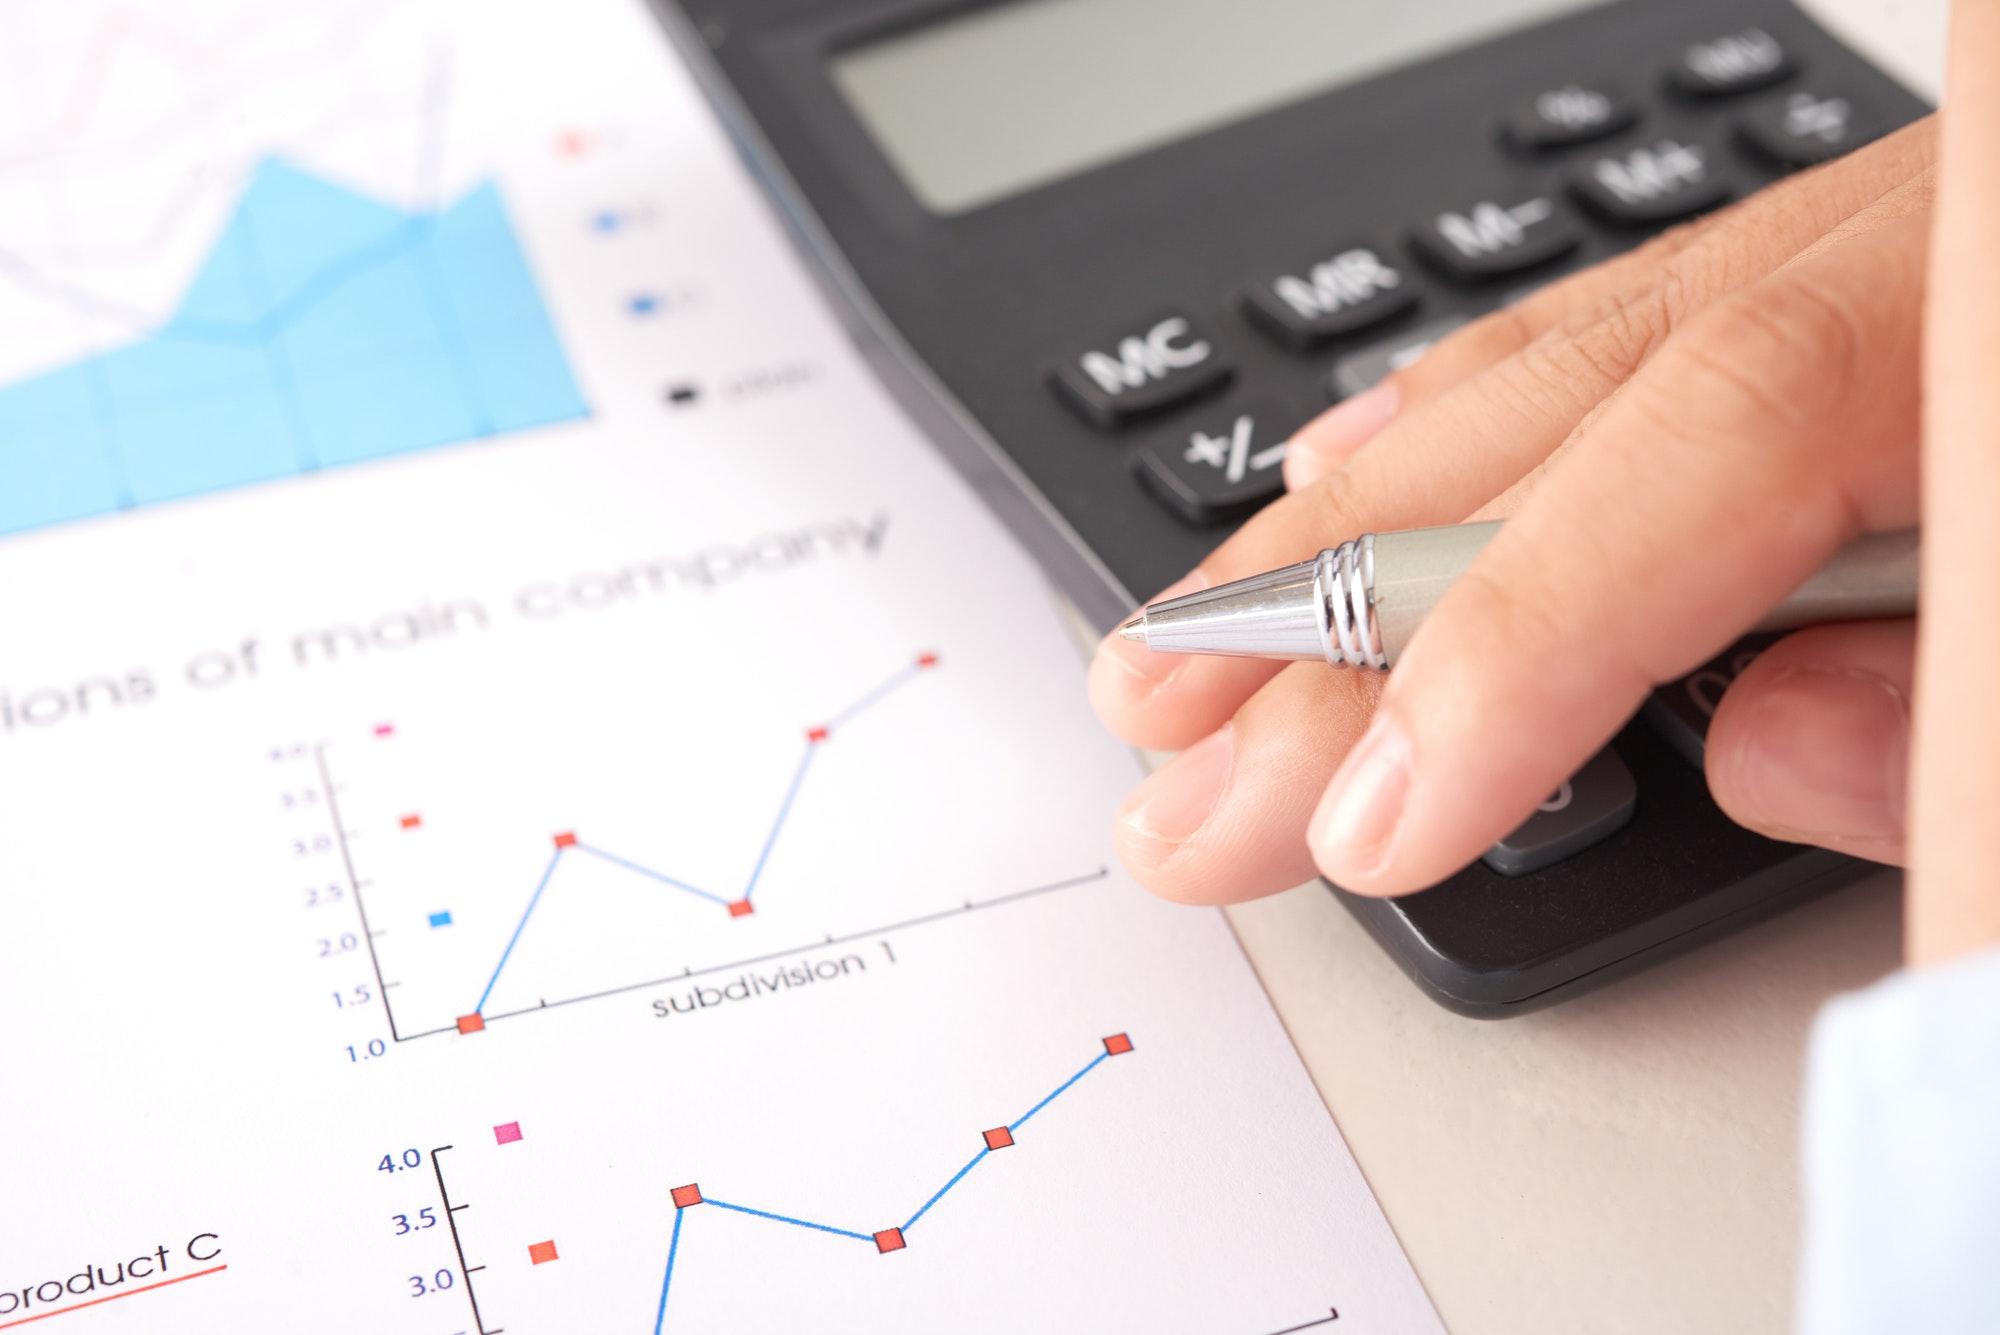 Crop hand near calculator and document